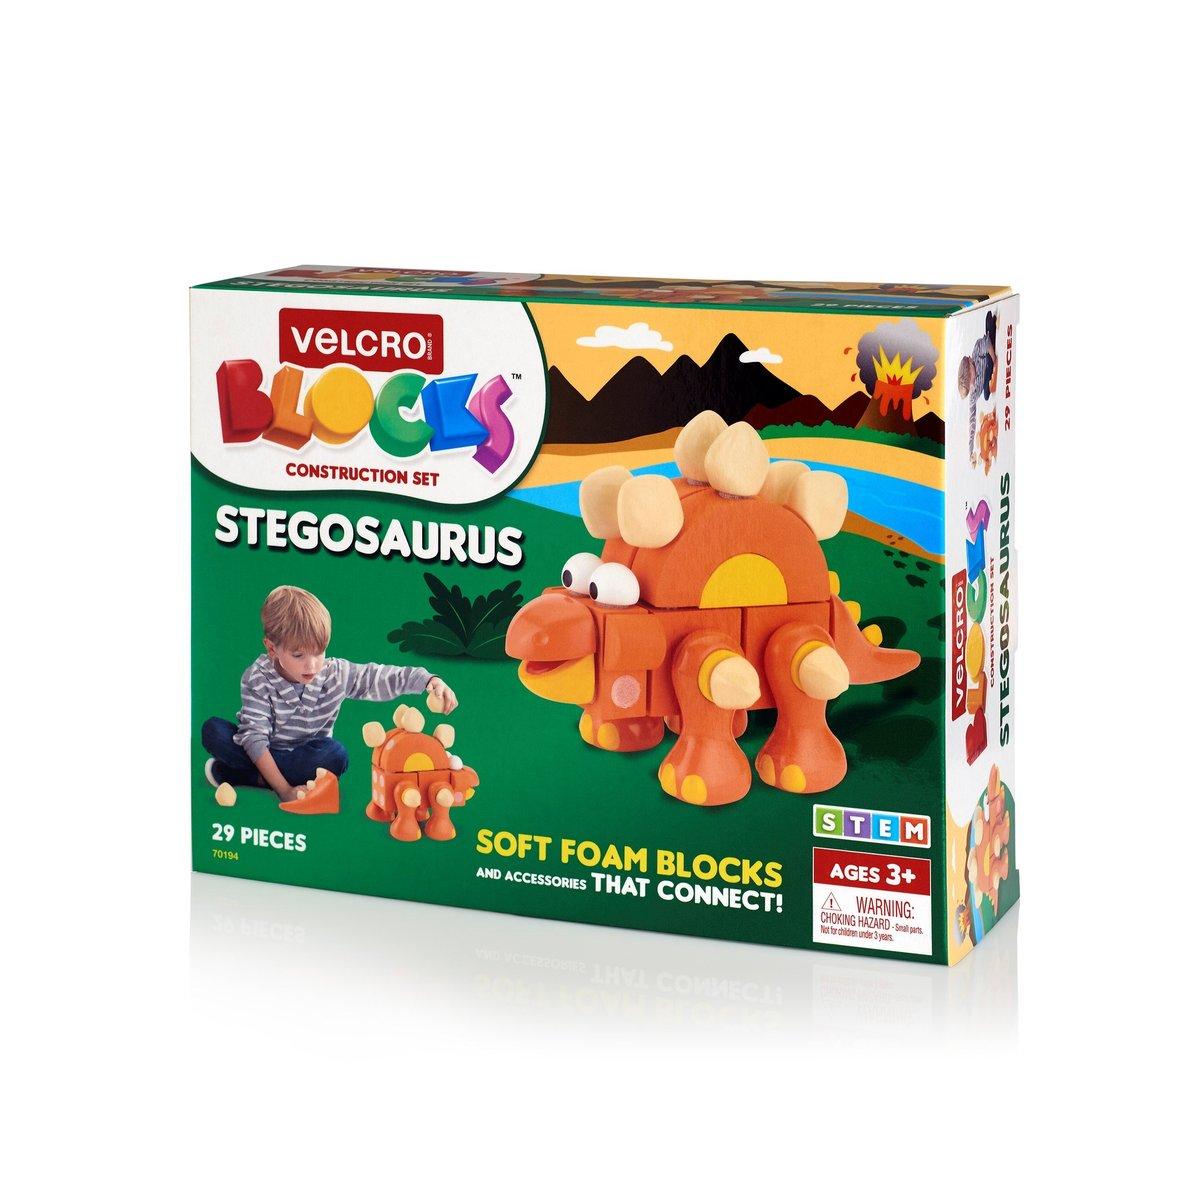 VELCRO® Brand Blocks Stegosaurus 29pcs